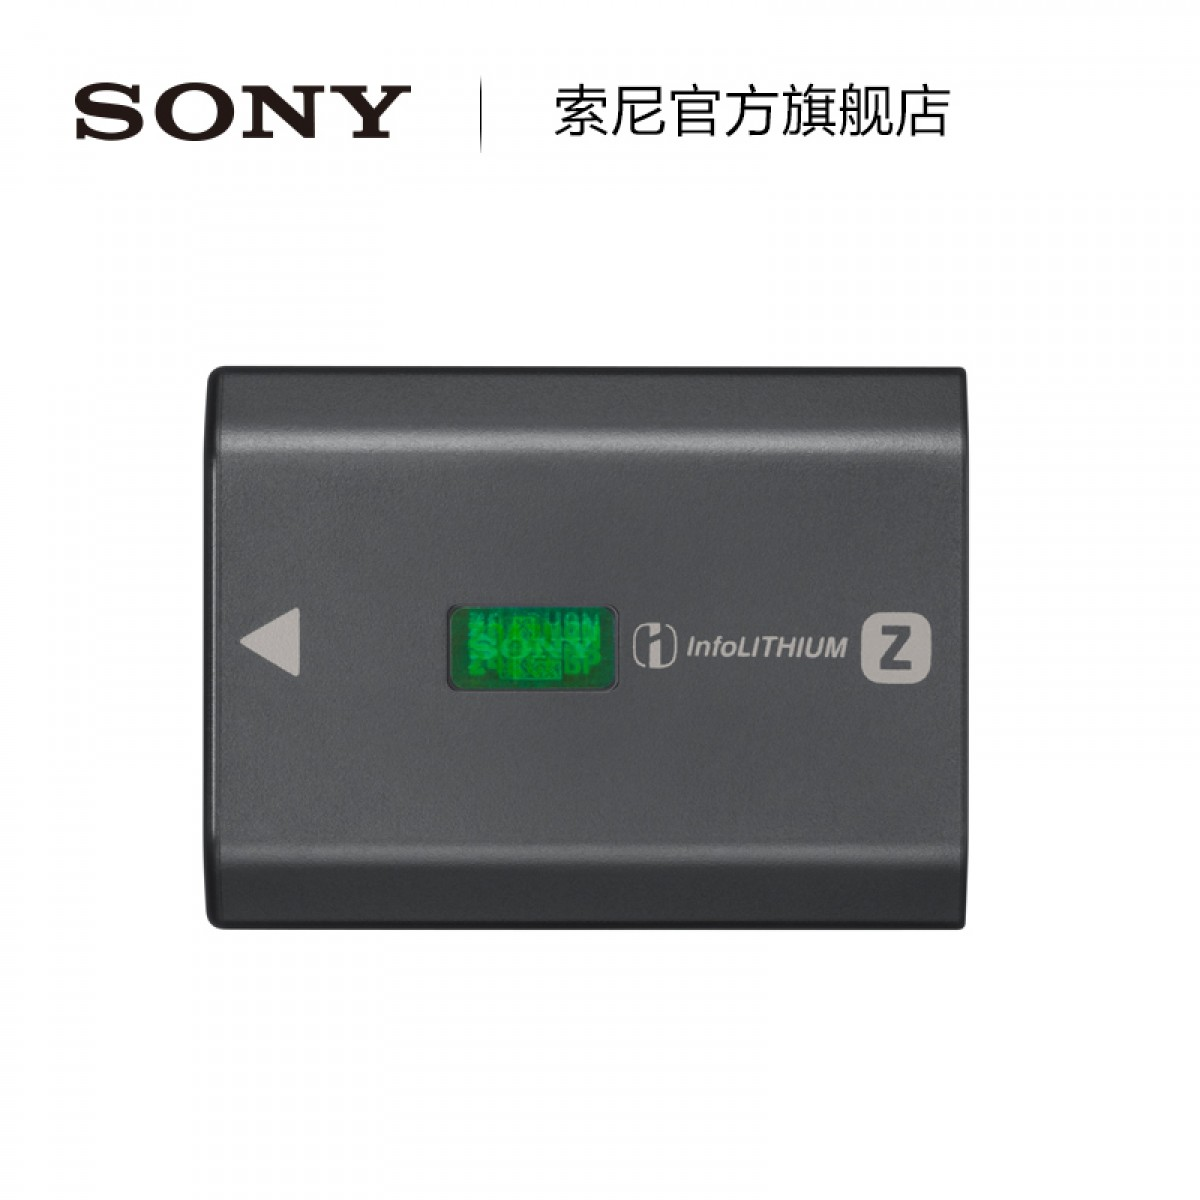 Sony/索尼 NP-FZ100 可重复充电电池适用于7R Ⅳ/7R Ⅲ/7 Ⅲ等